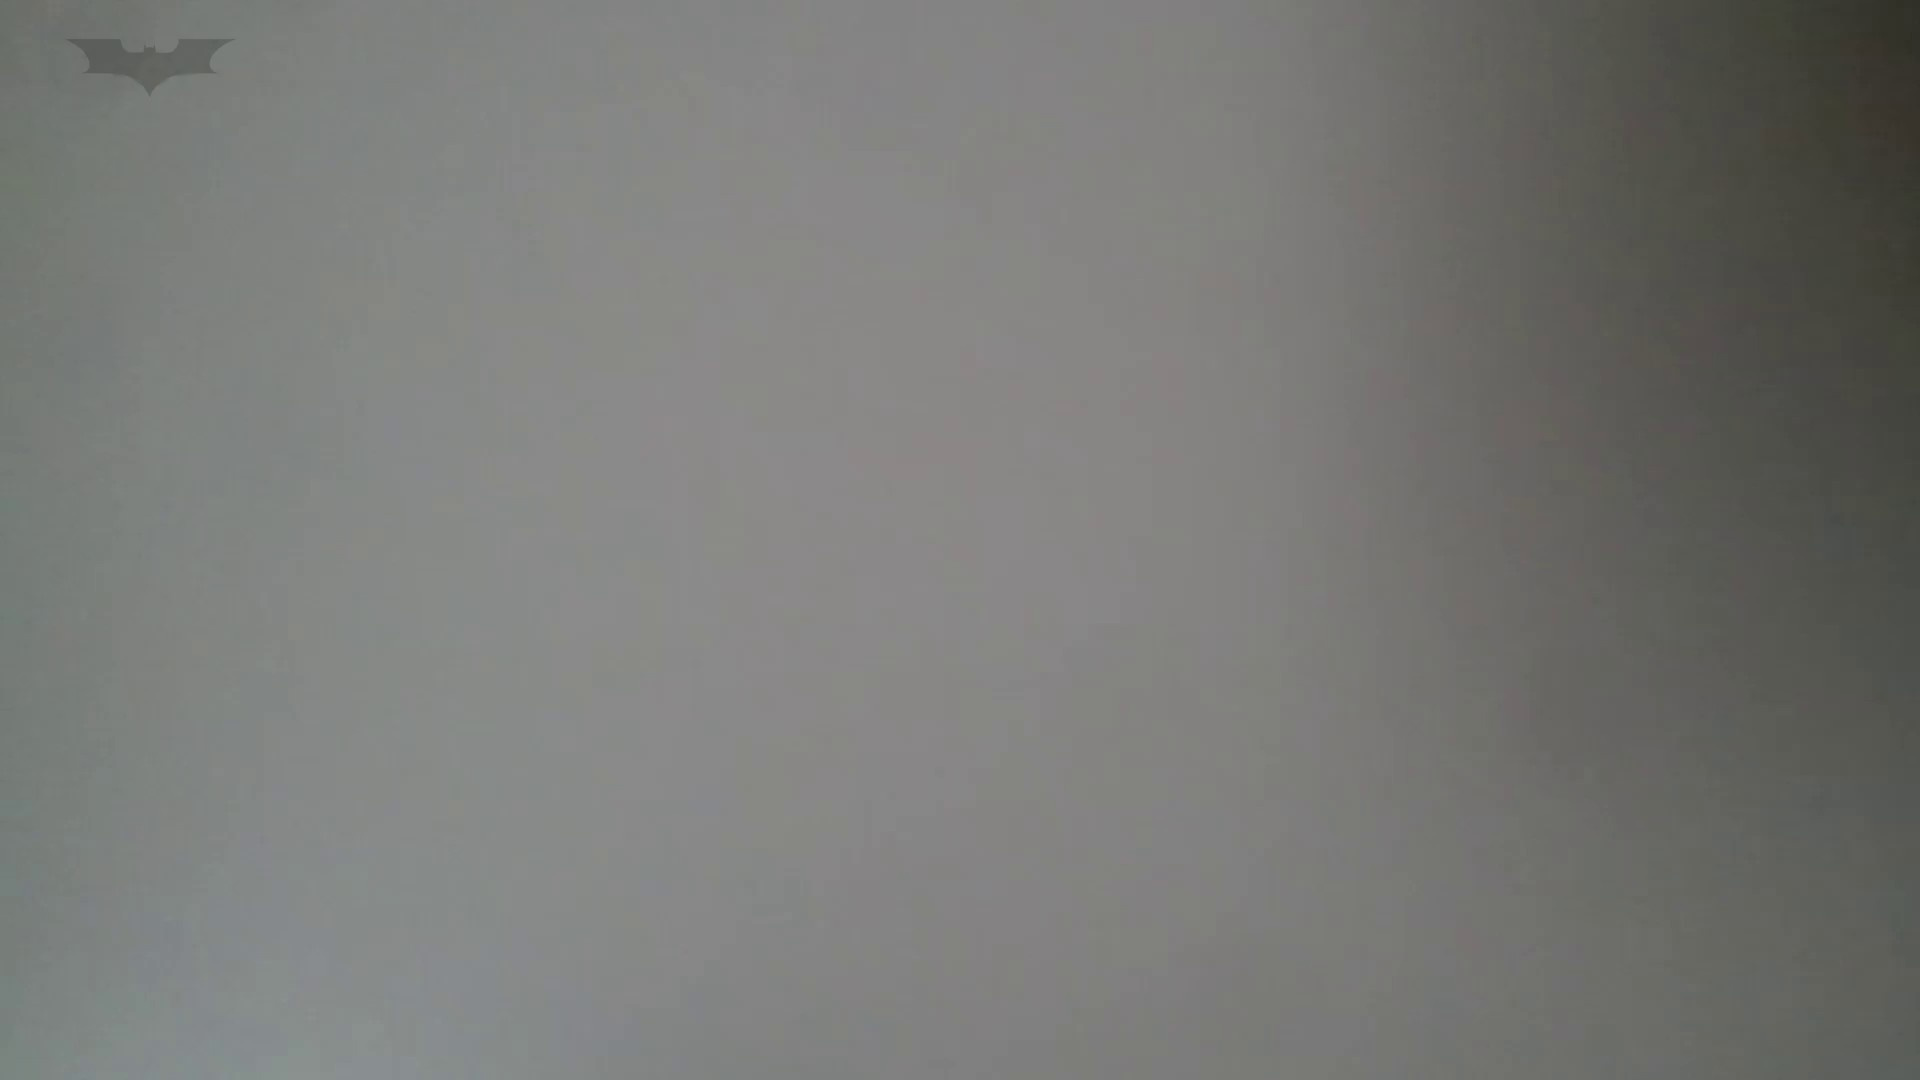 化粧室絵巻 番外編 VOL.22 OLハメ撮り  27Pix 26